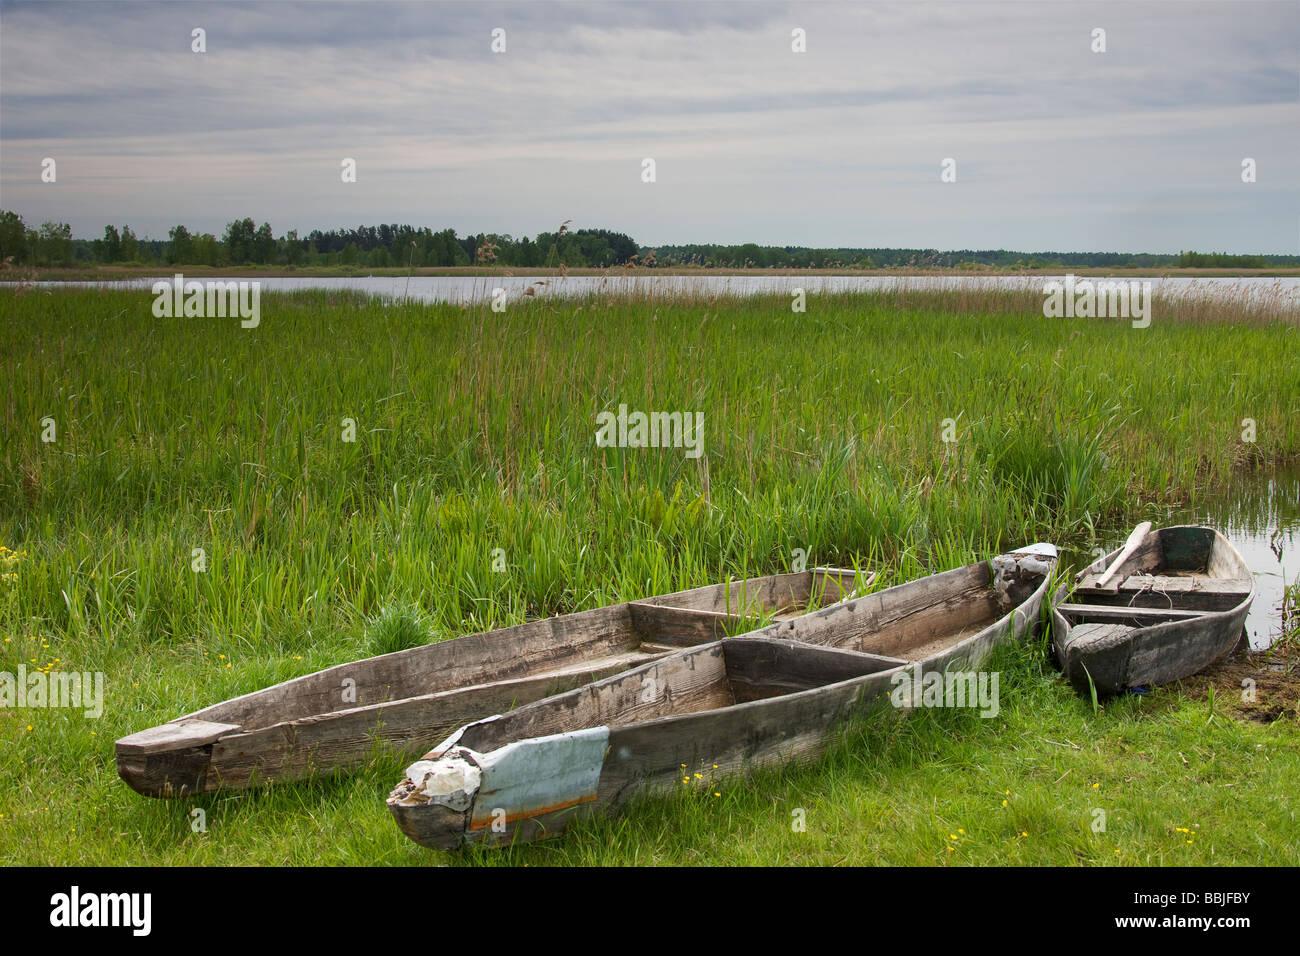 Flat-bottomed canoes (punts) on shore of lake. - Stock Image